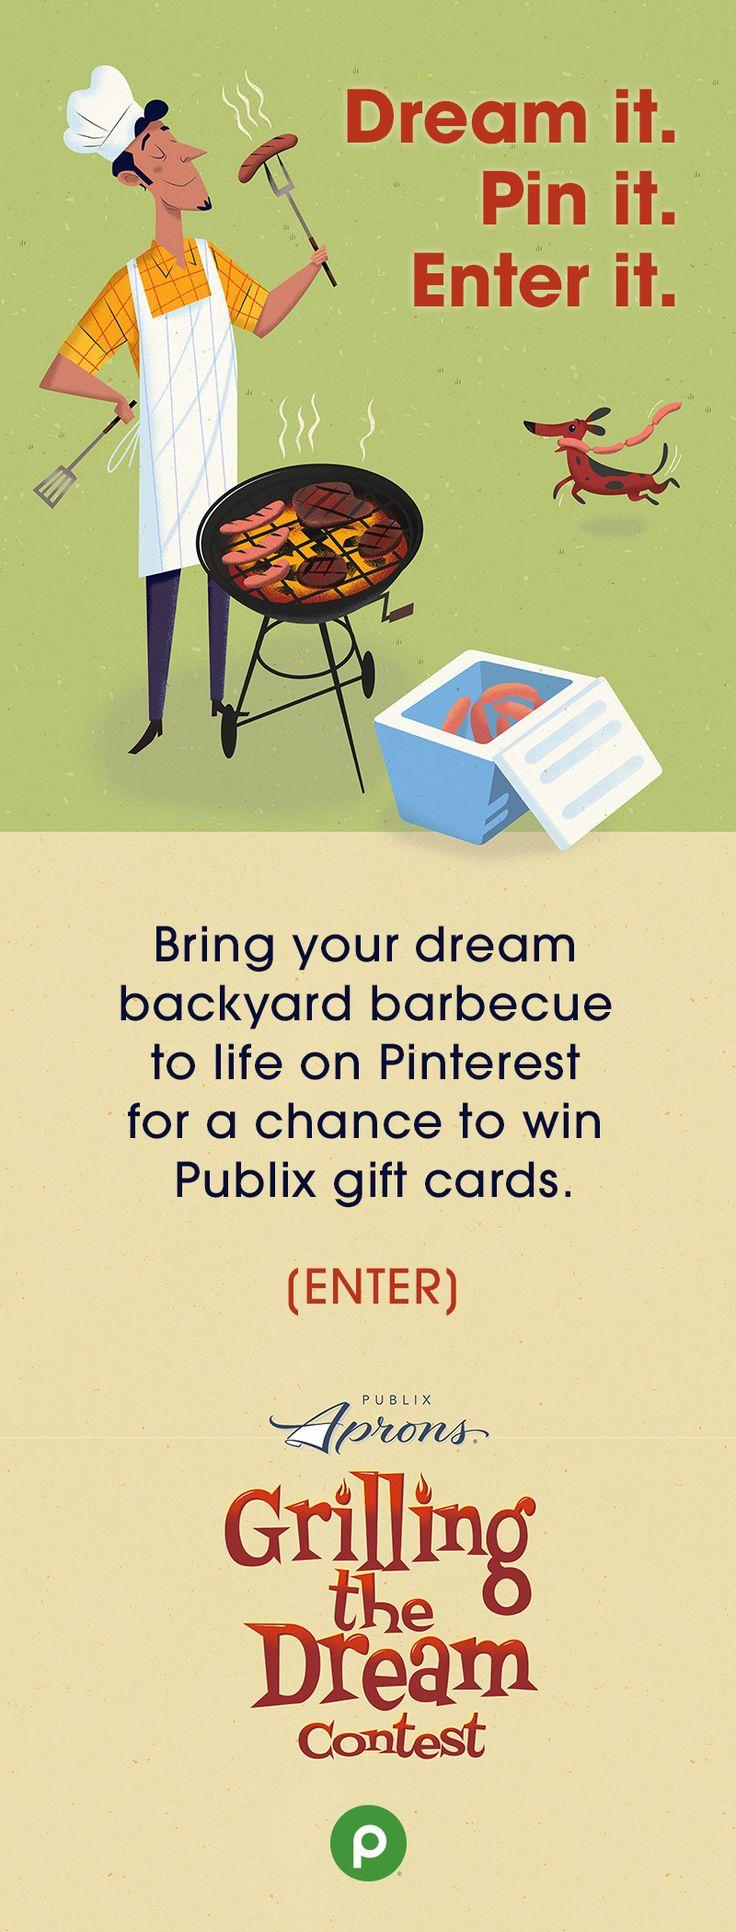 28 best publix aprons grilling the dream contest images on